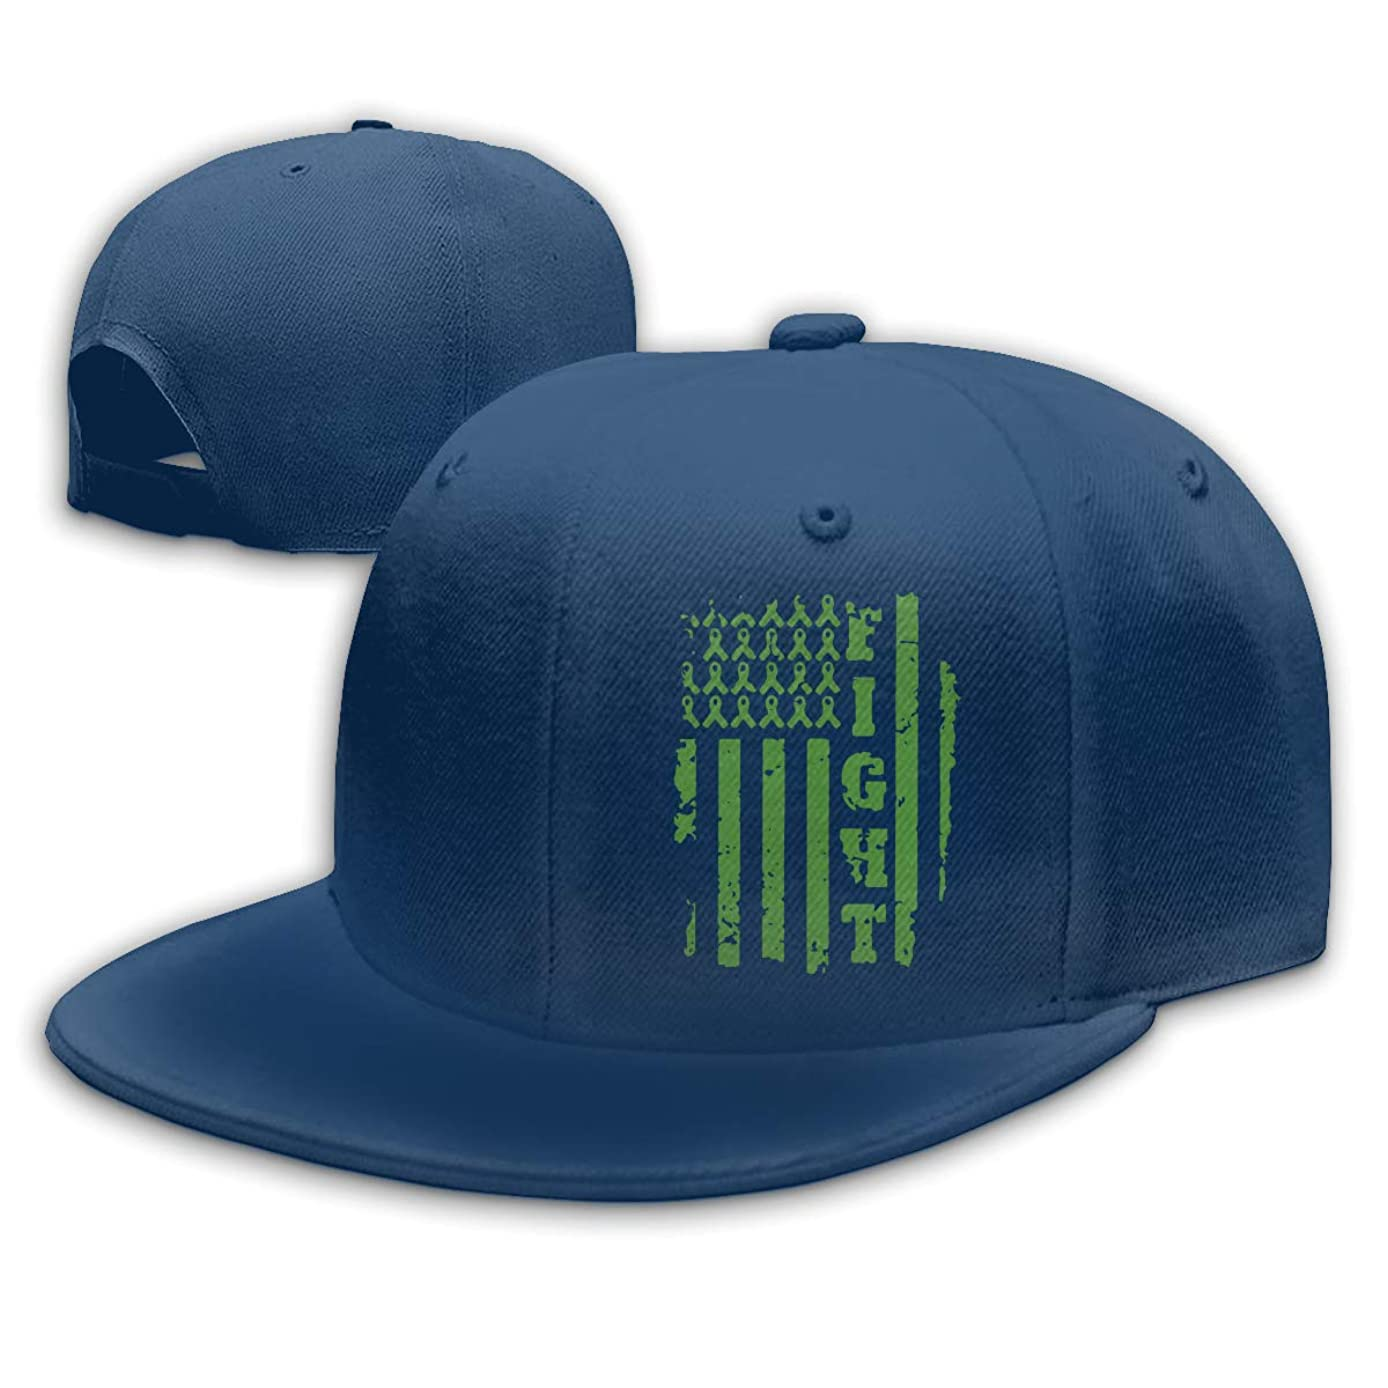 Bile Duct Cancer Awareness Mens Womens Adjustable Plain Baseball Cap Dad Hat